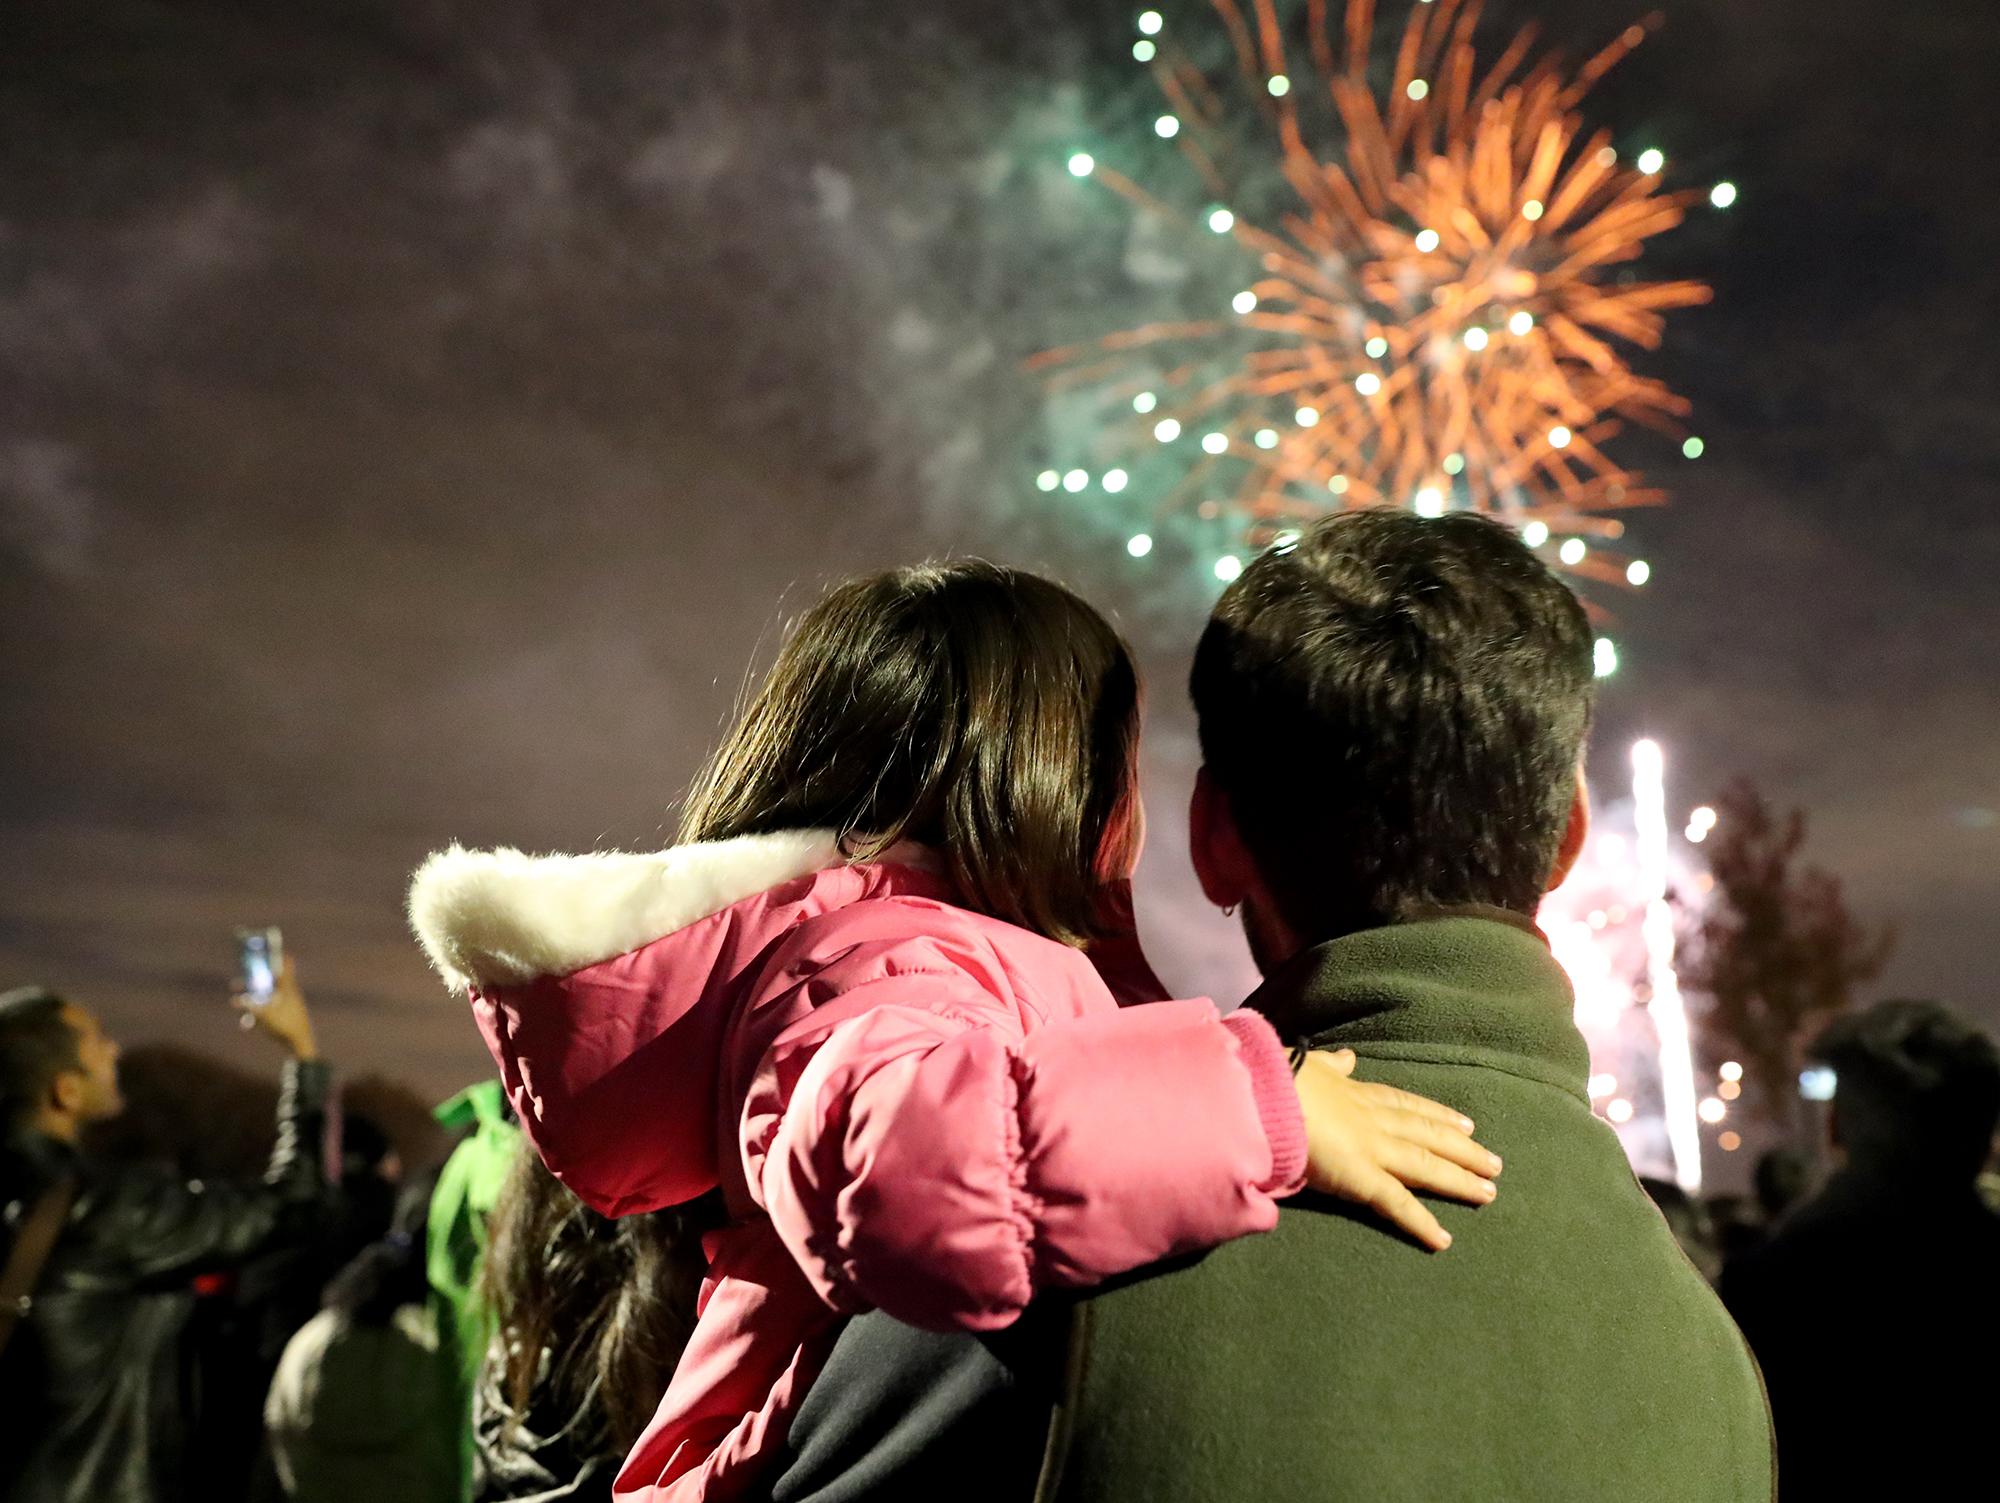 181107_london_diwali-fireworks_08